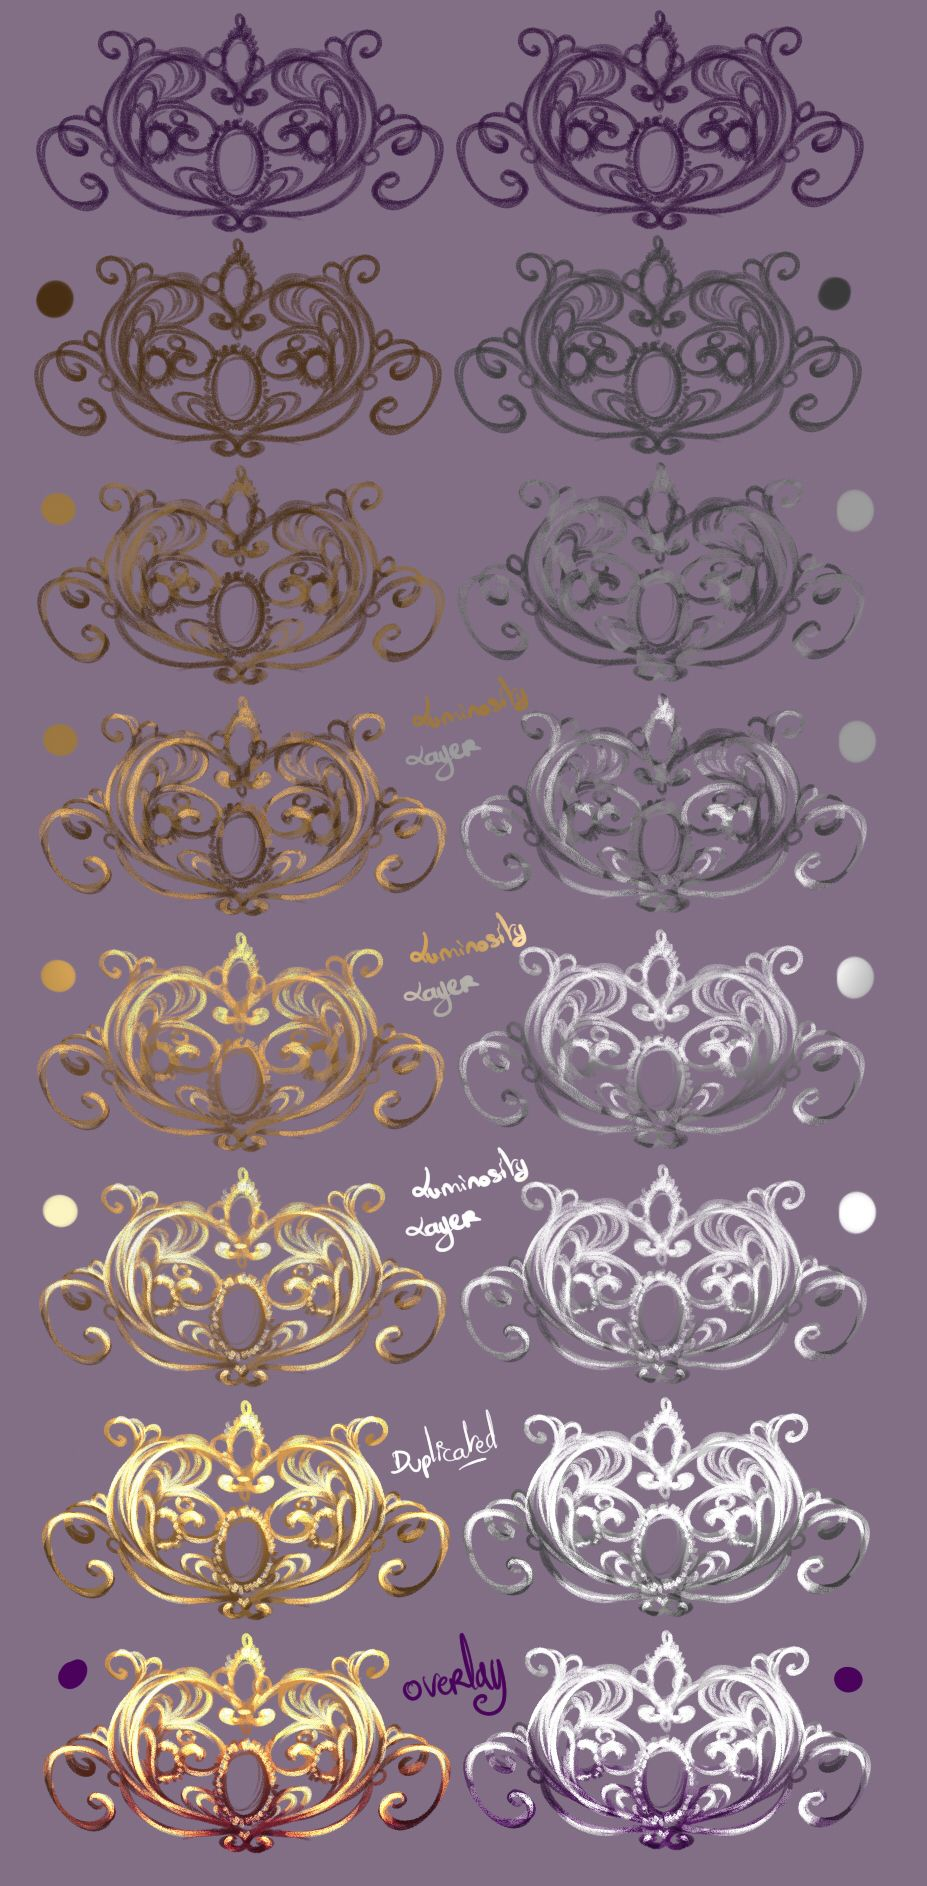 How I paint Jewelry GoldnSilver by rikadono tiara necklace